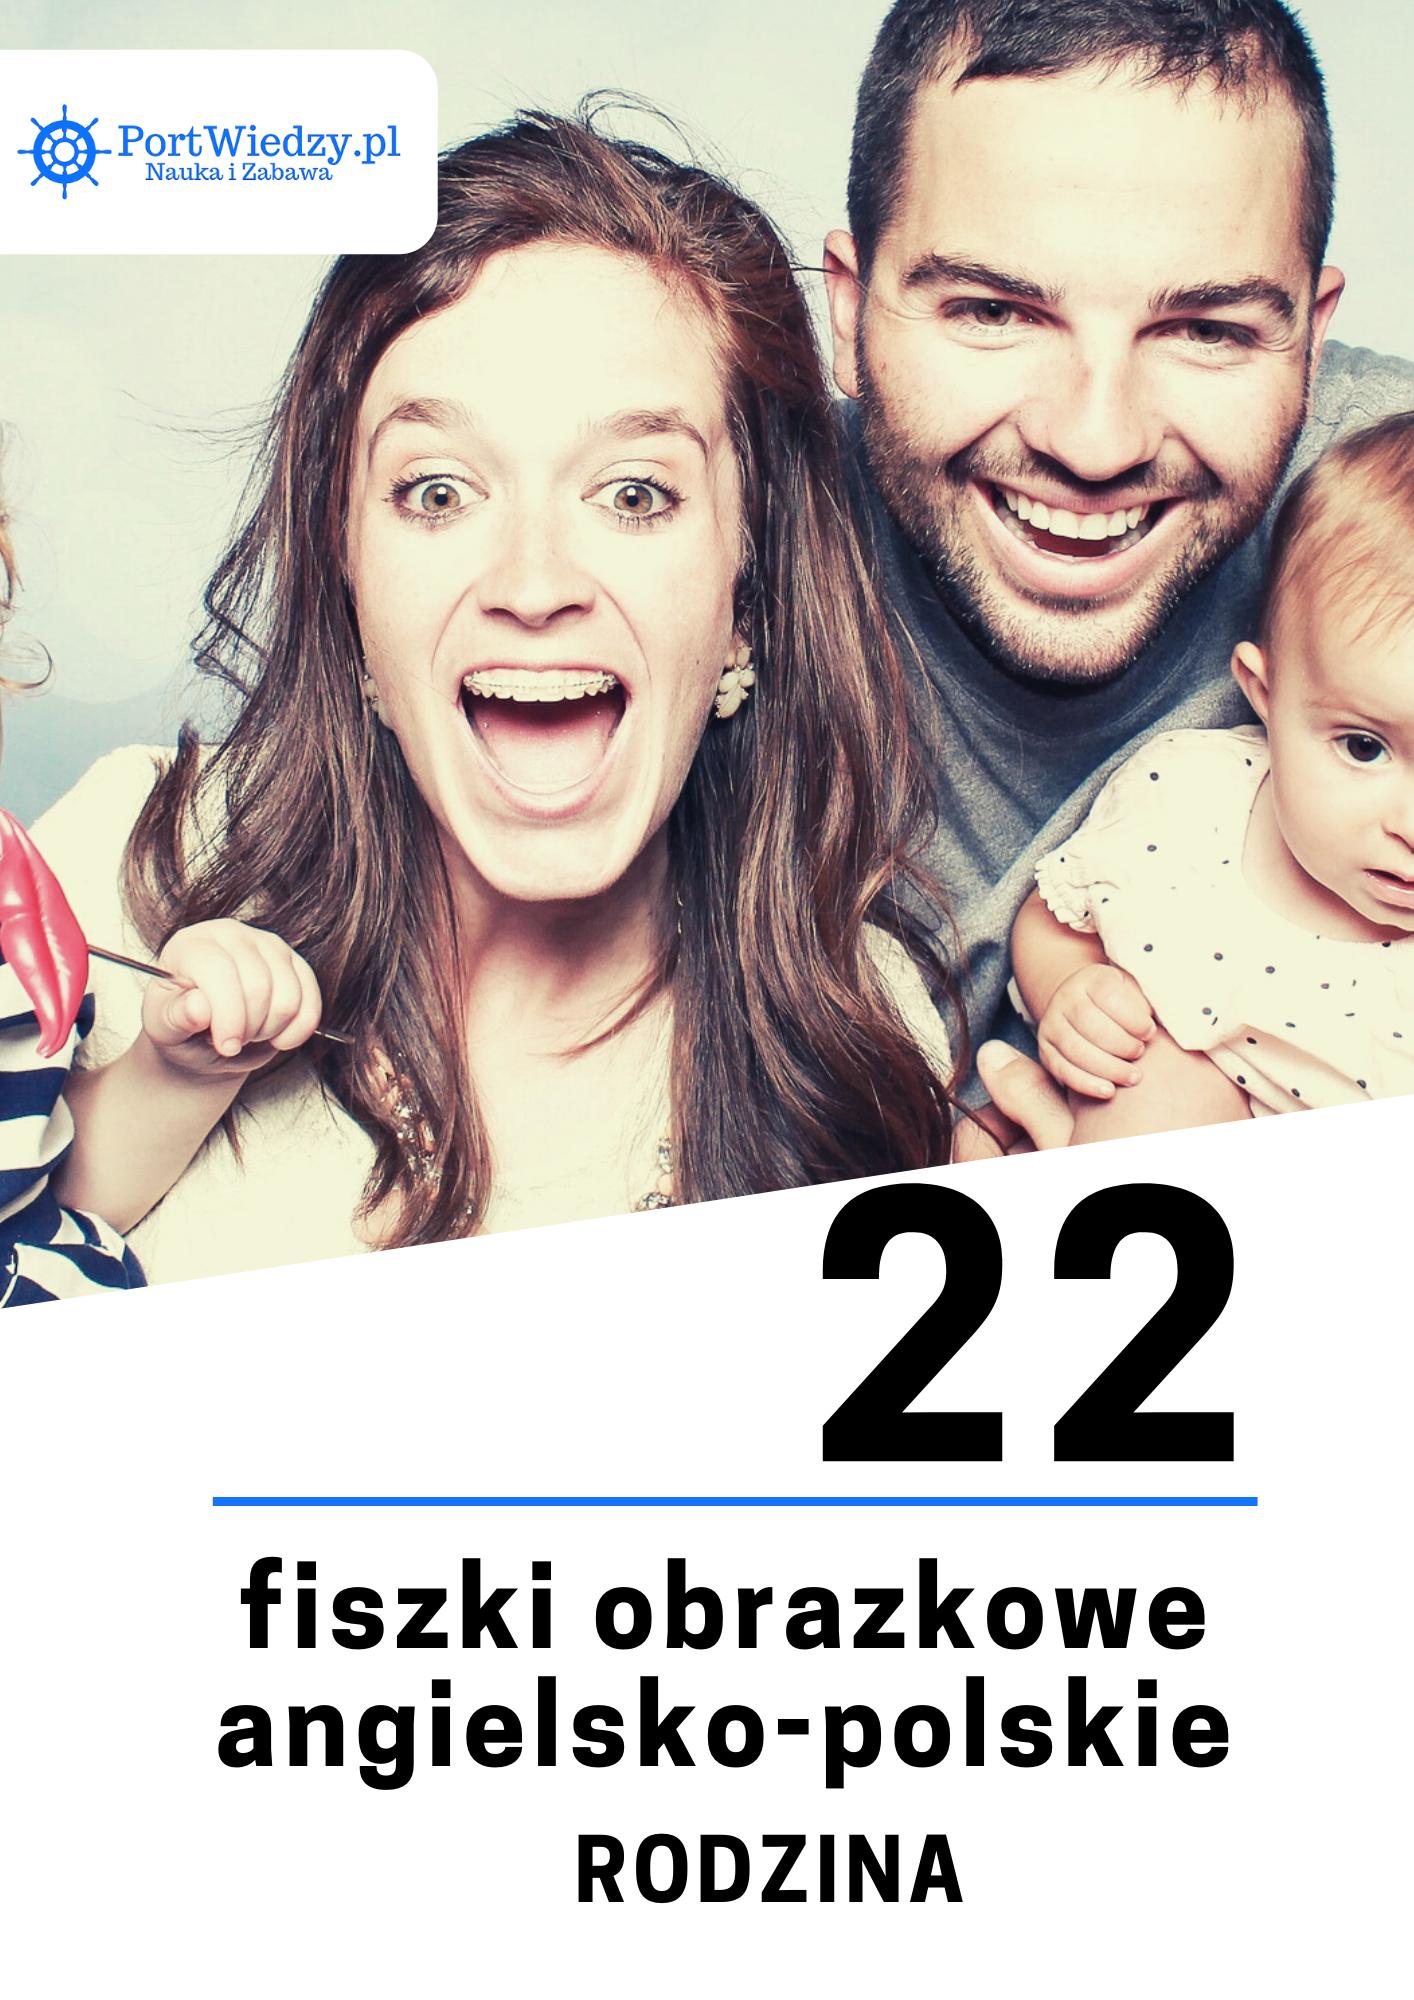 angielska rodzina fiszki - angielska_rodzina_fiszki